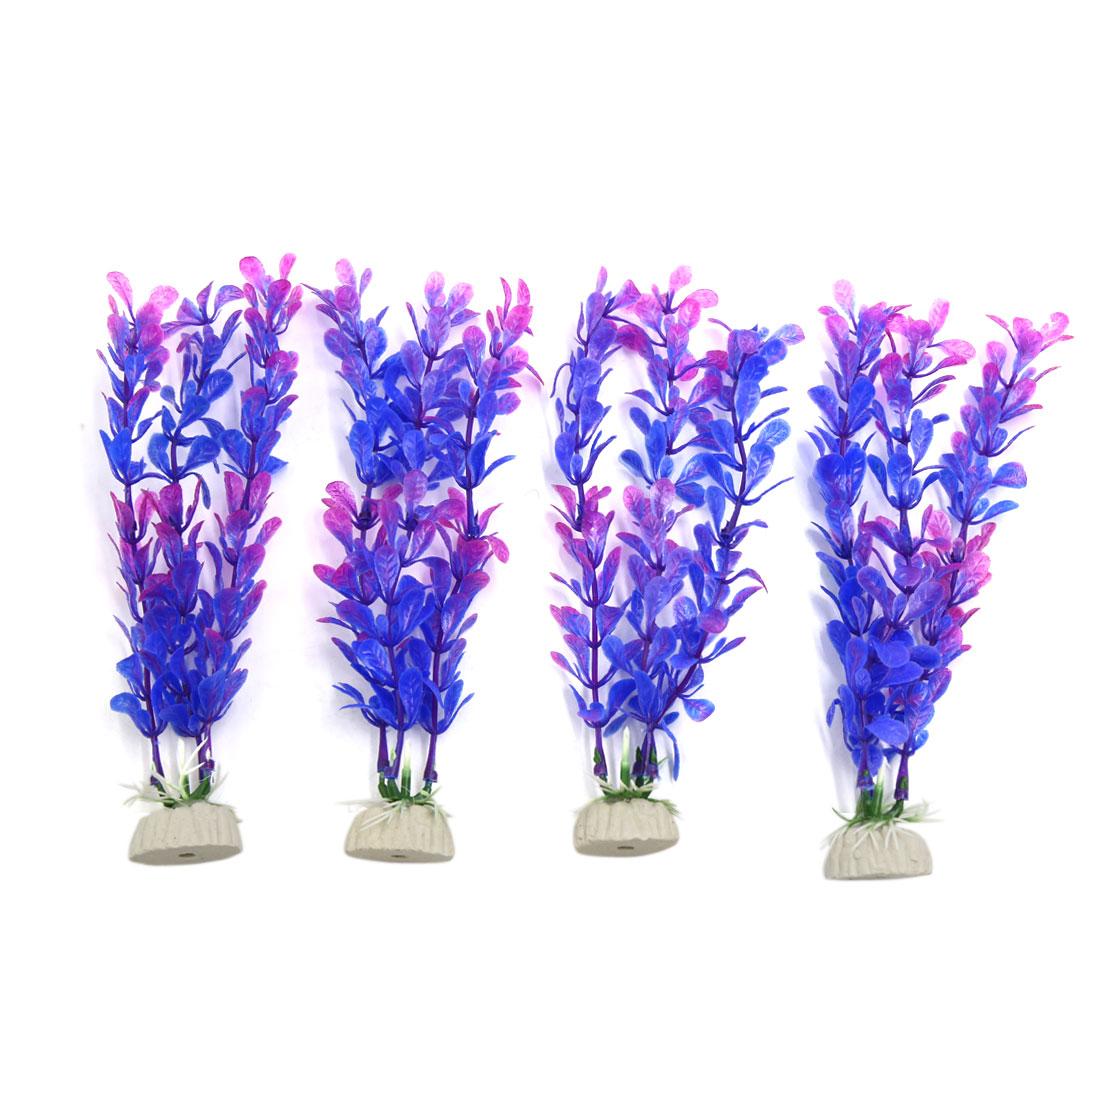 4pcs Purple Plastic Aquarium Leaves Plants Fish Tank Underwater Plant Decoration